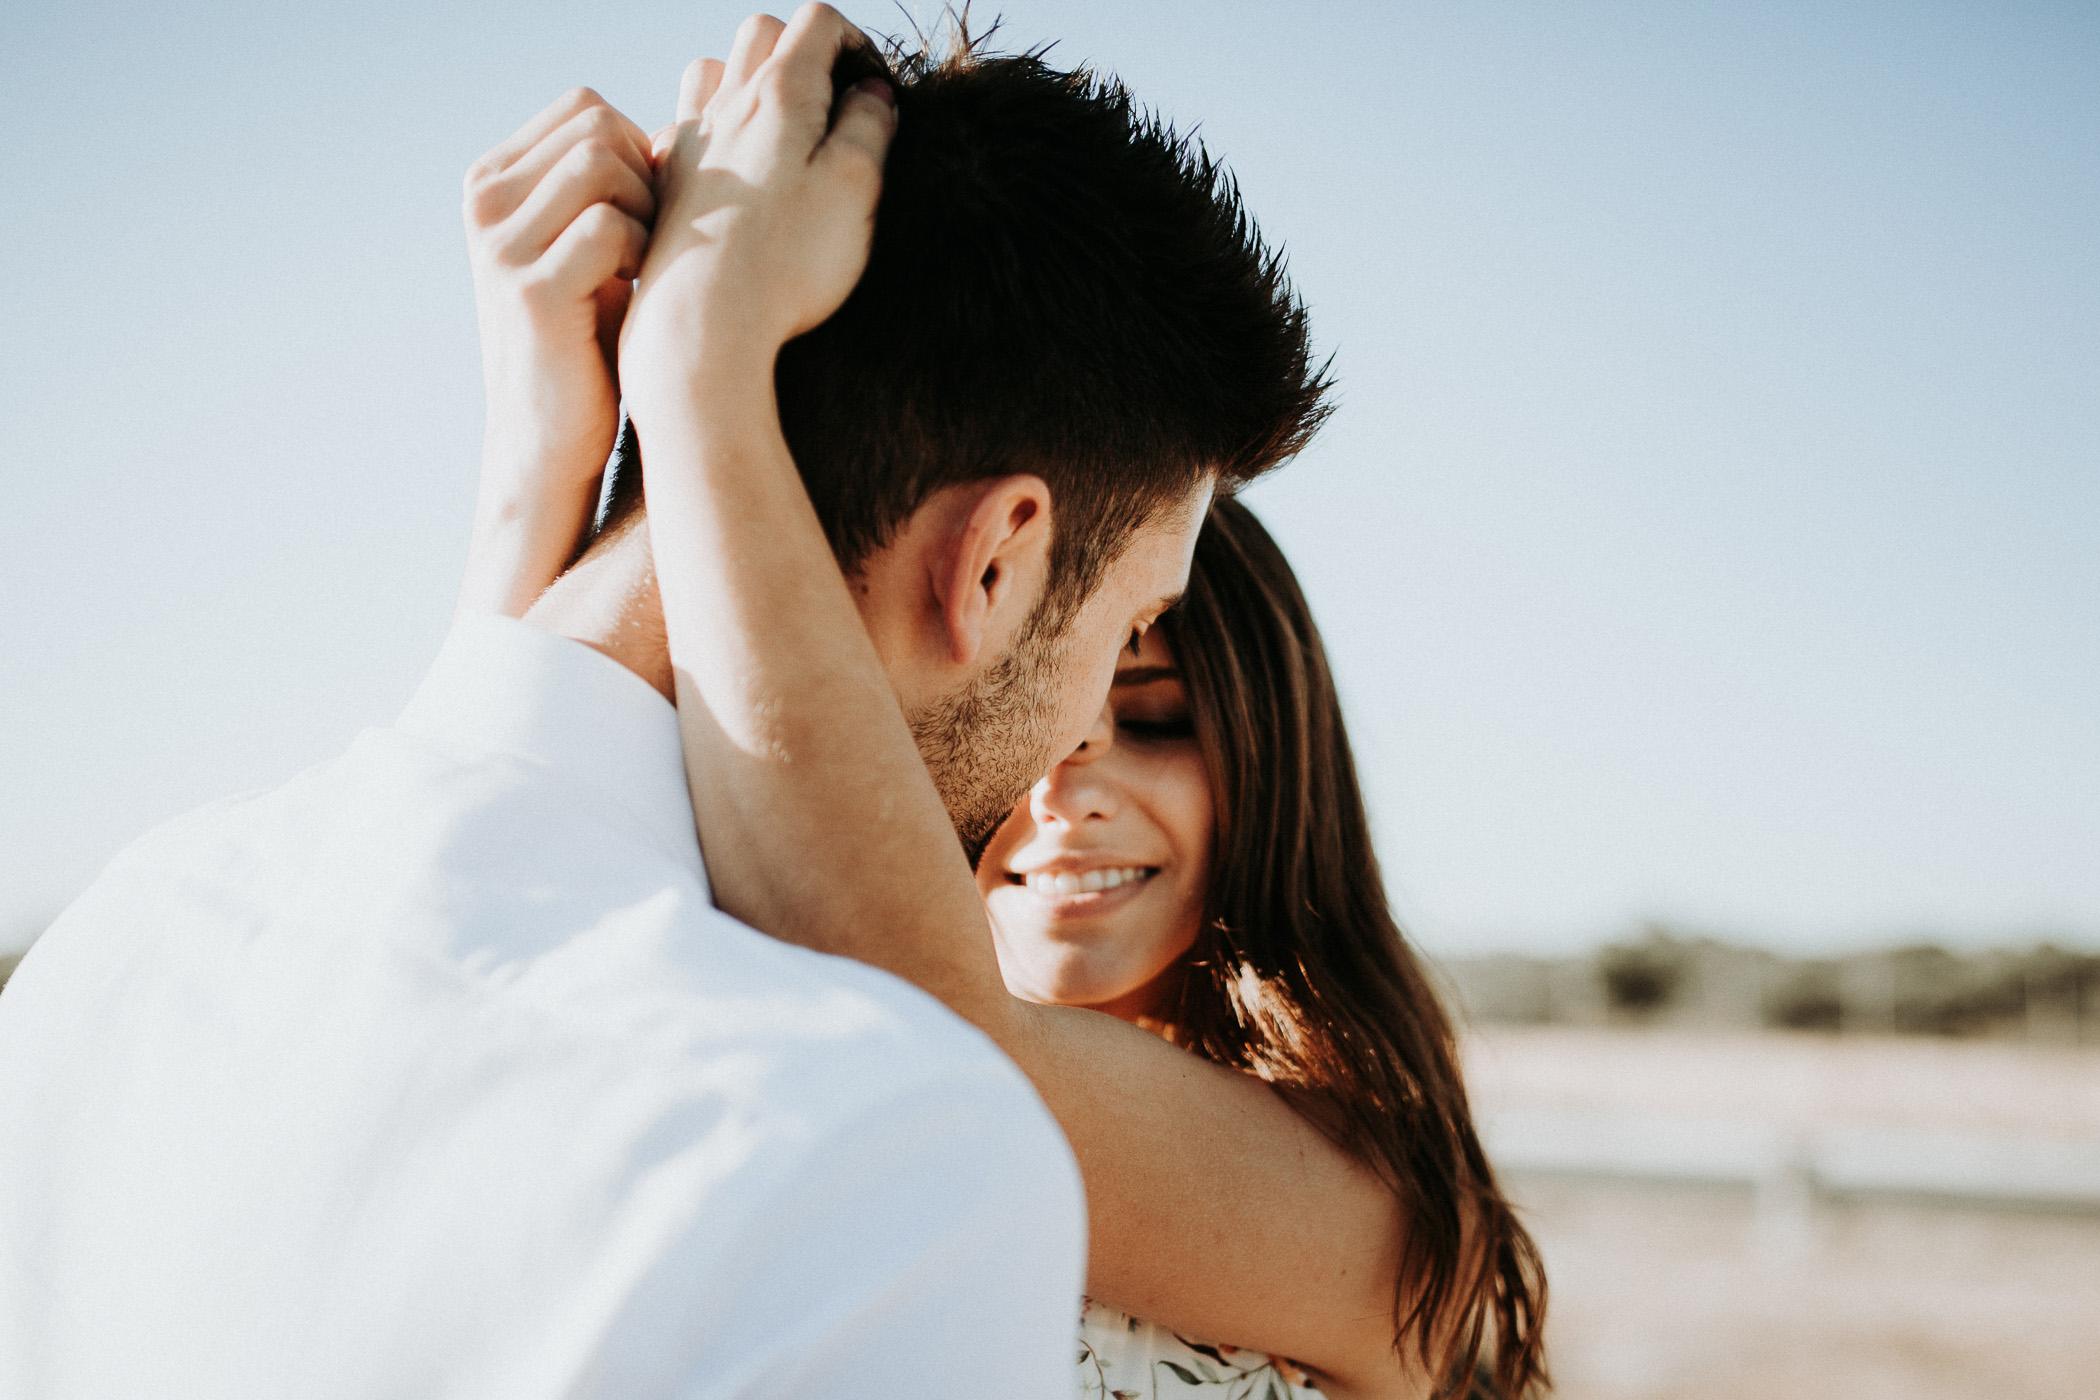 DanielaMarquardtPhotography_wedding_elopement_mallorca_spain_calapi_palma_lauraandtoni_343